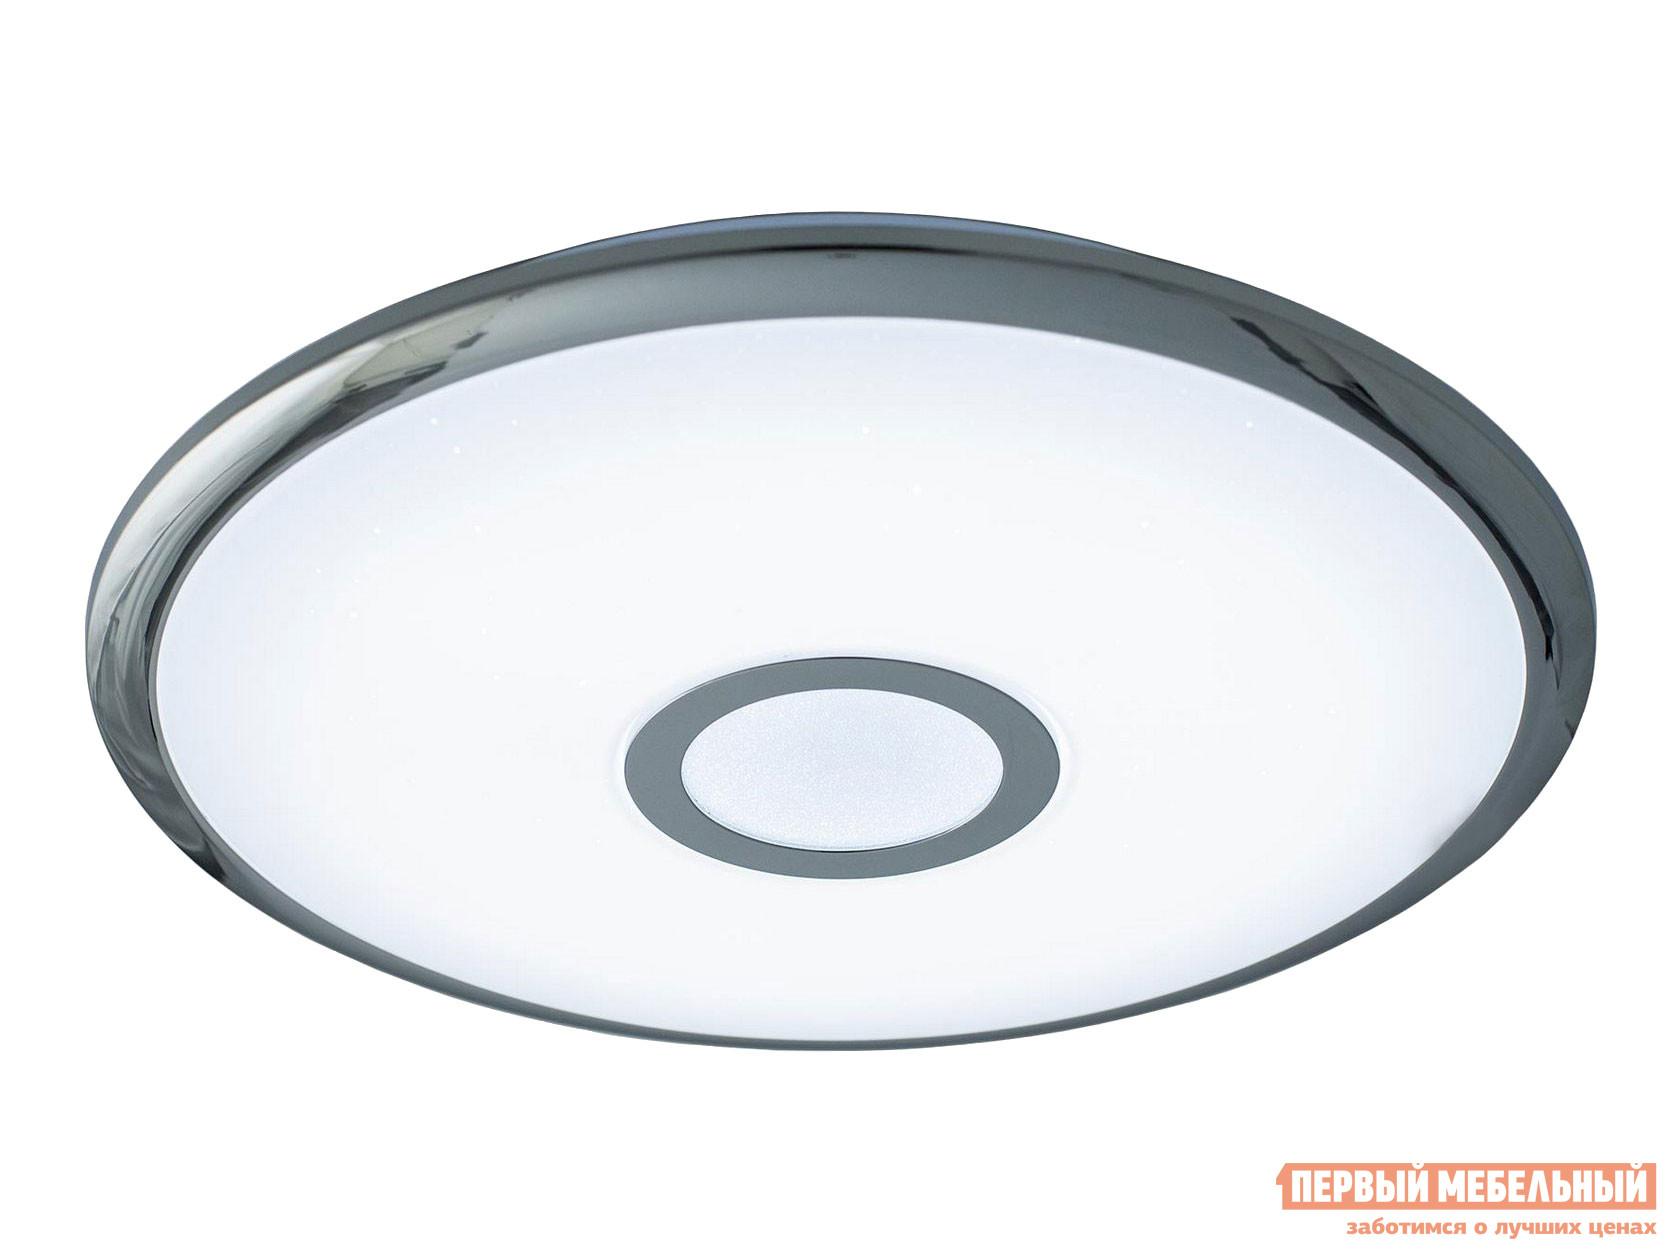 Потолочная люстра  CL703A30G Старлайт Смарт RGB Белый / Хром СитиЛюкс 127985